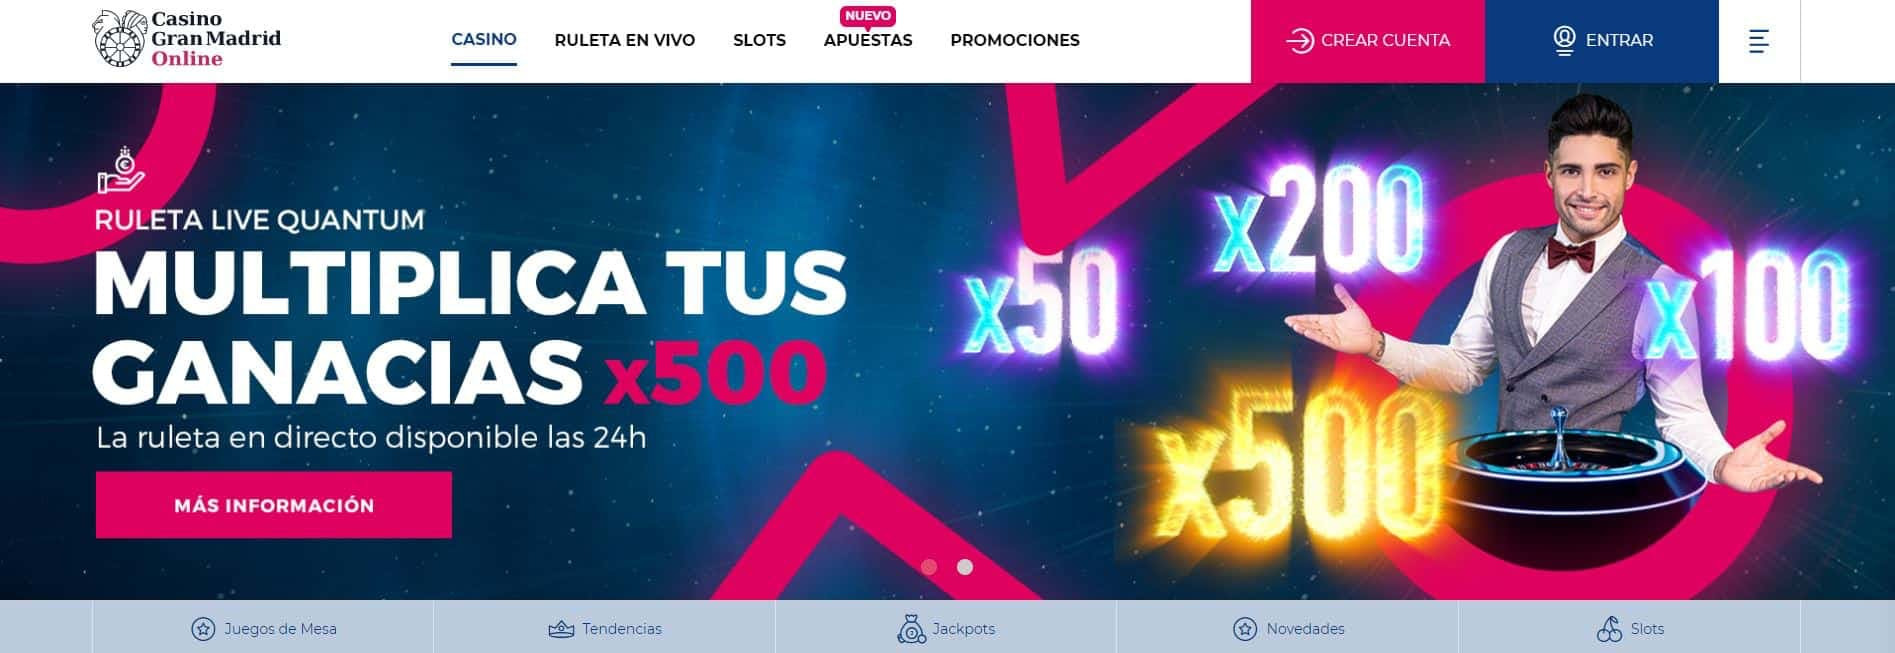 Grand Madrid casino online español